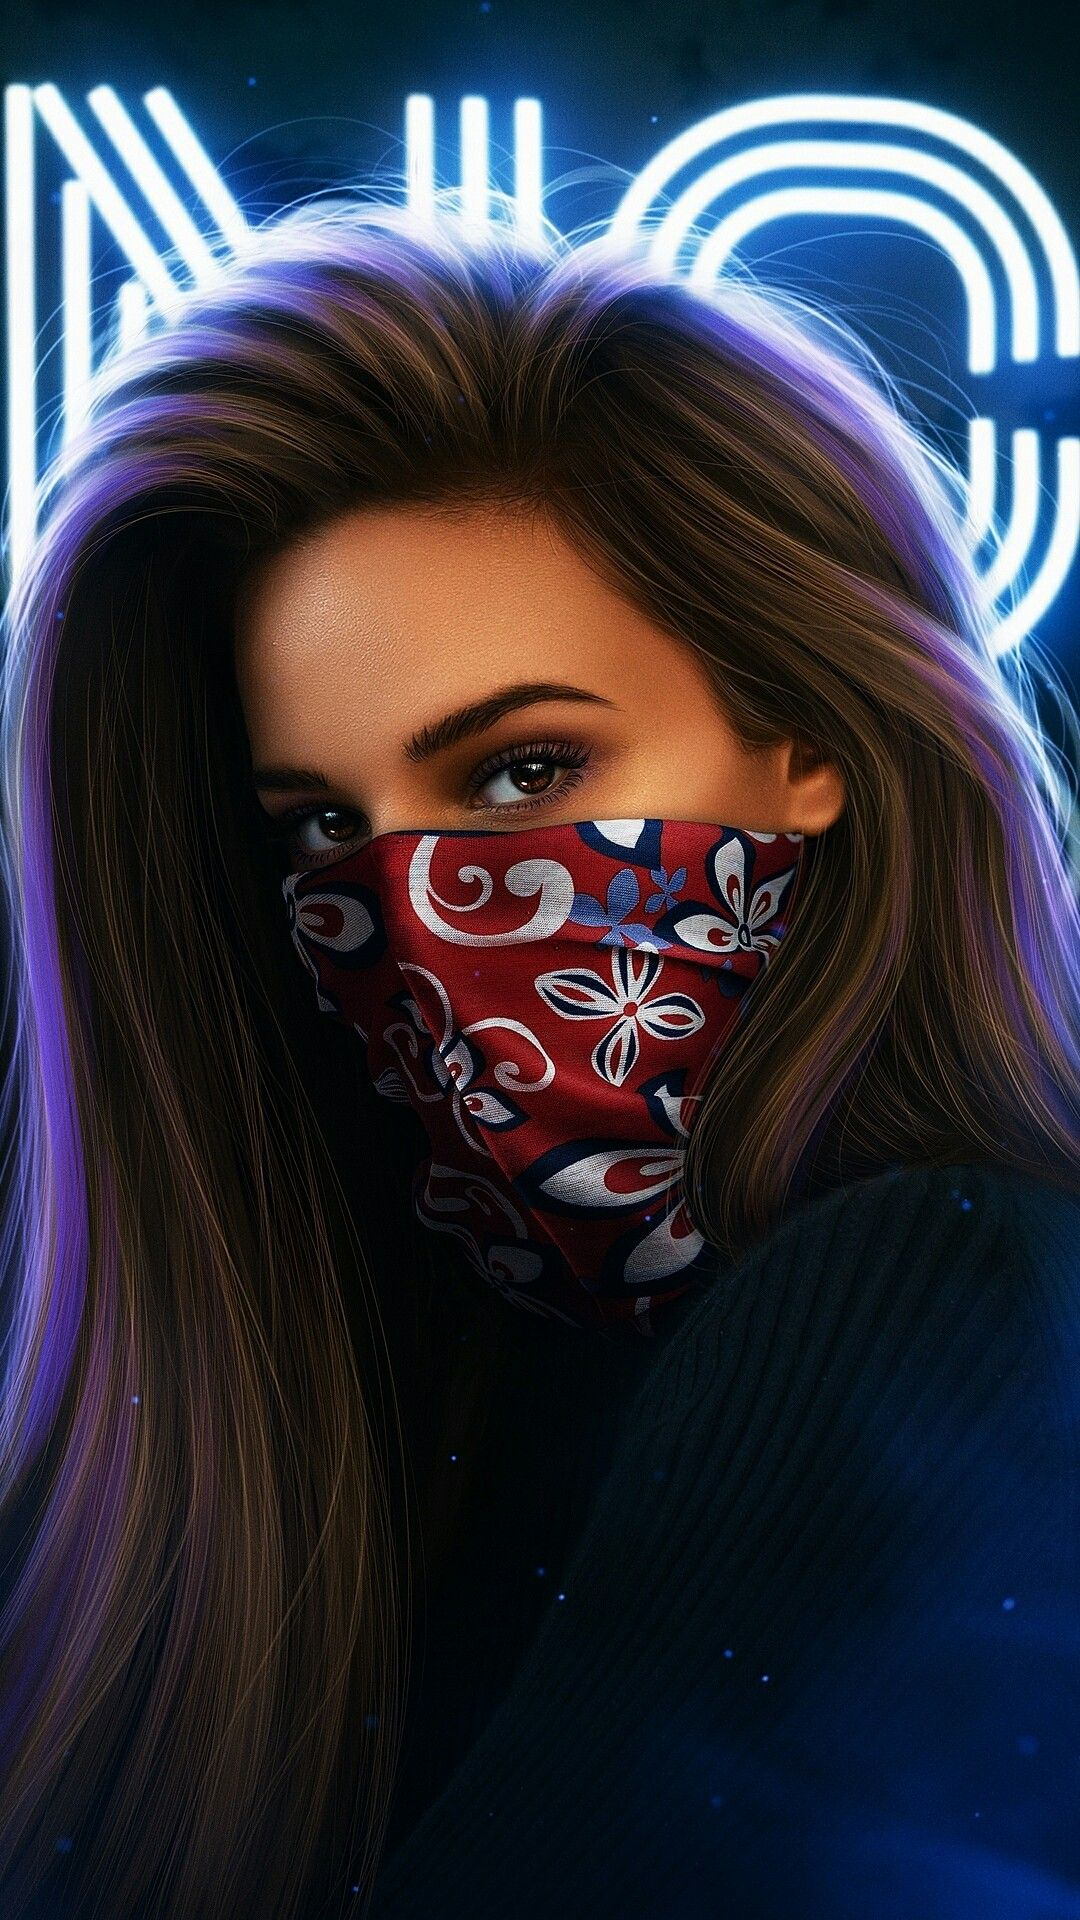 Imagen girls   Girl iphone wallpaper, Girl photography, Cartoon ...